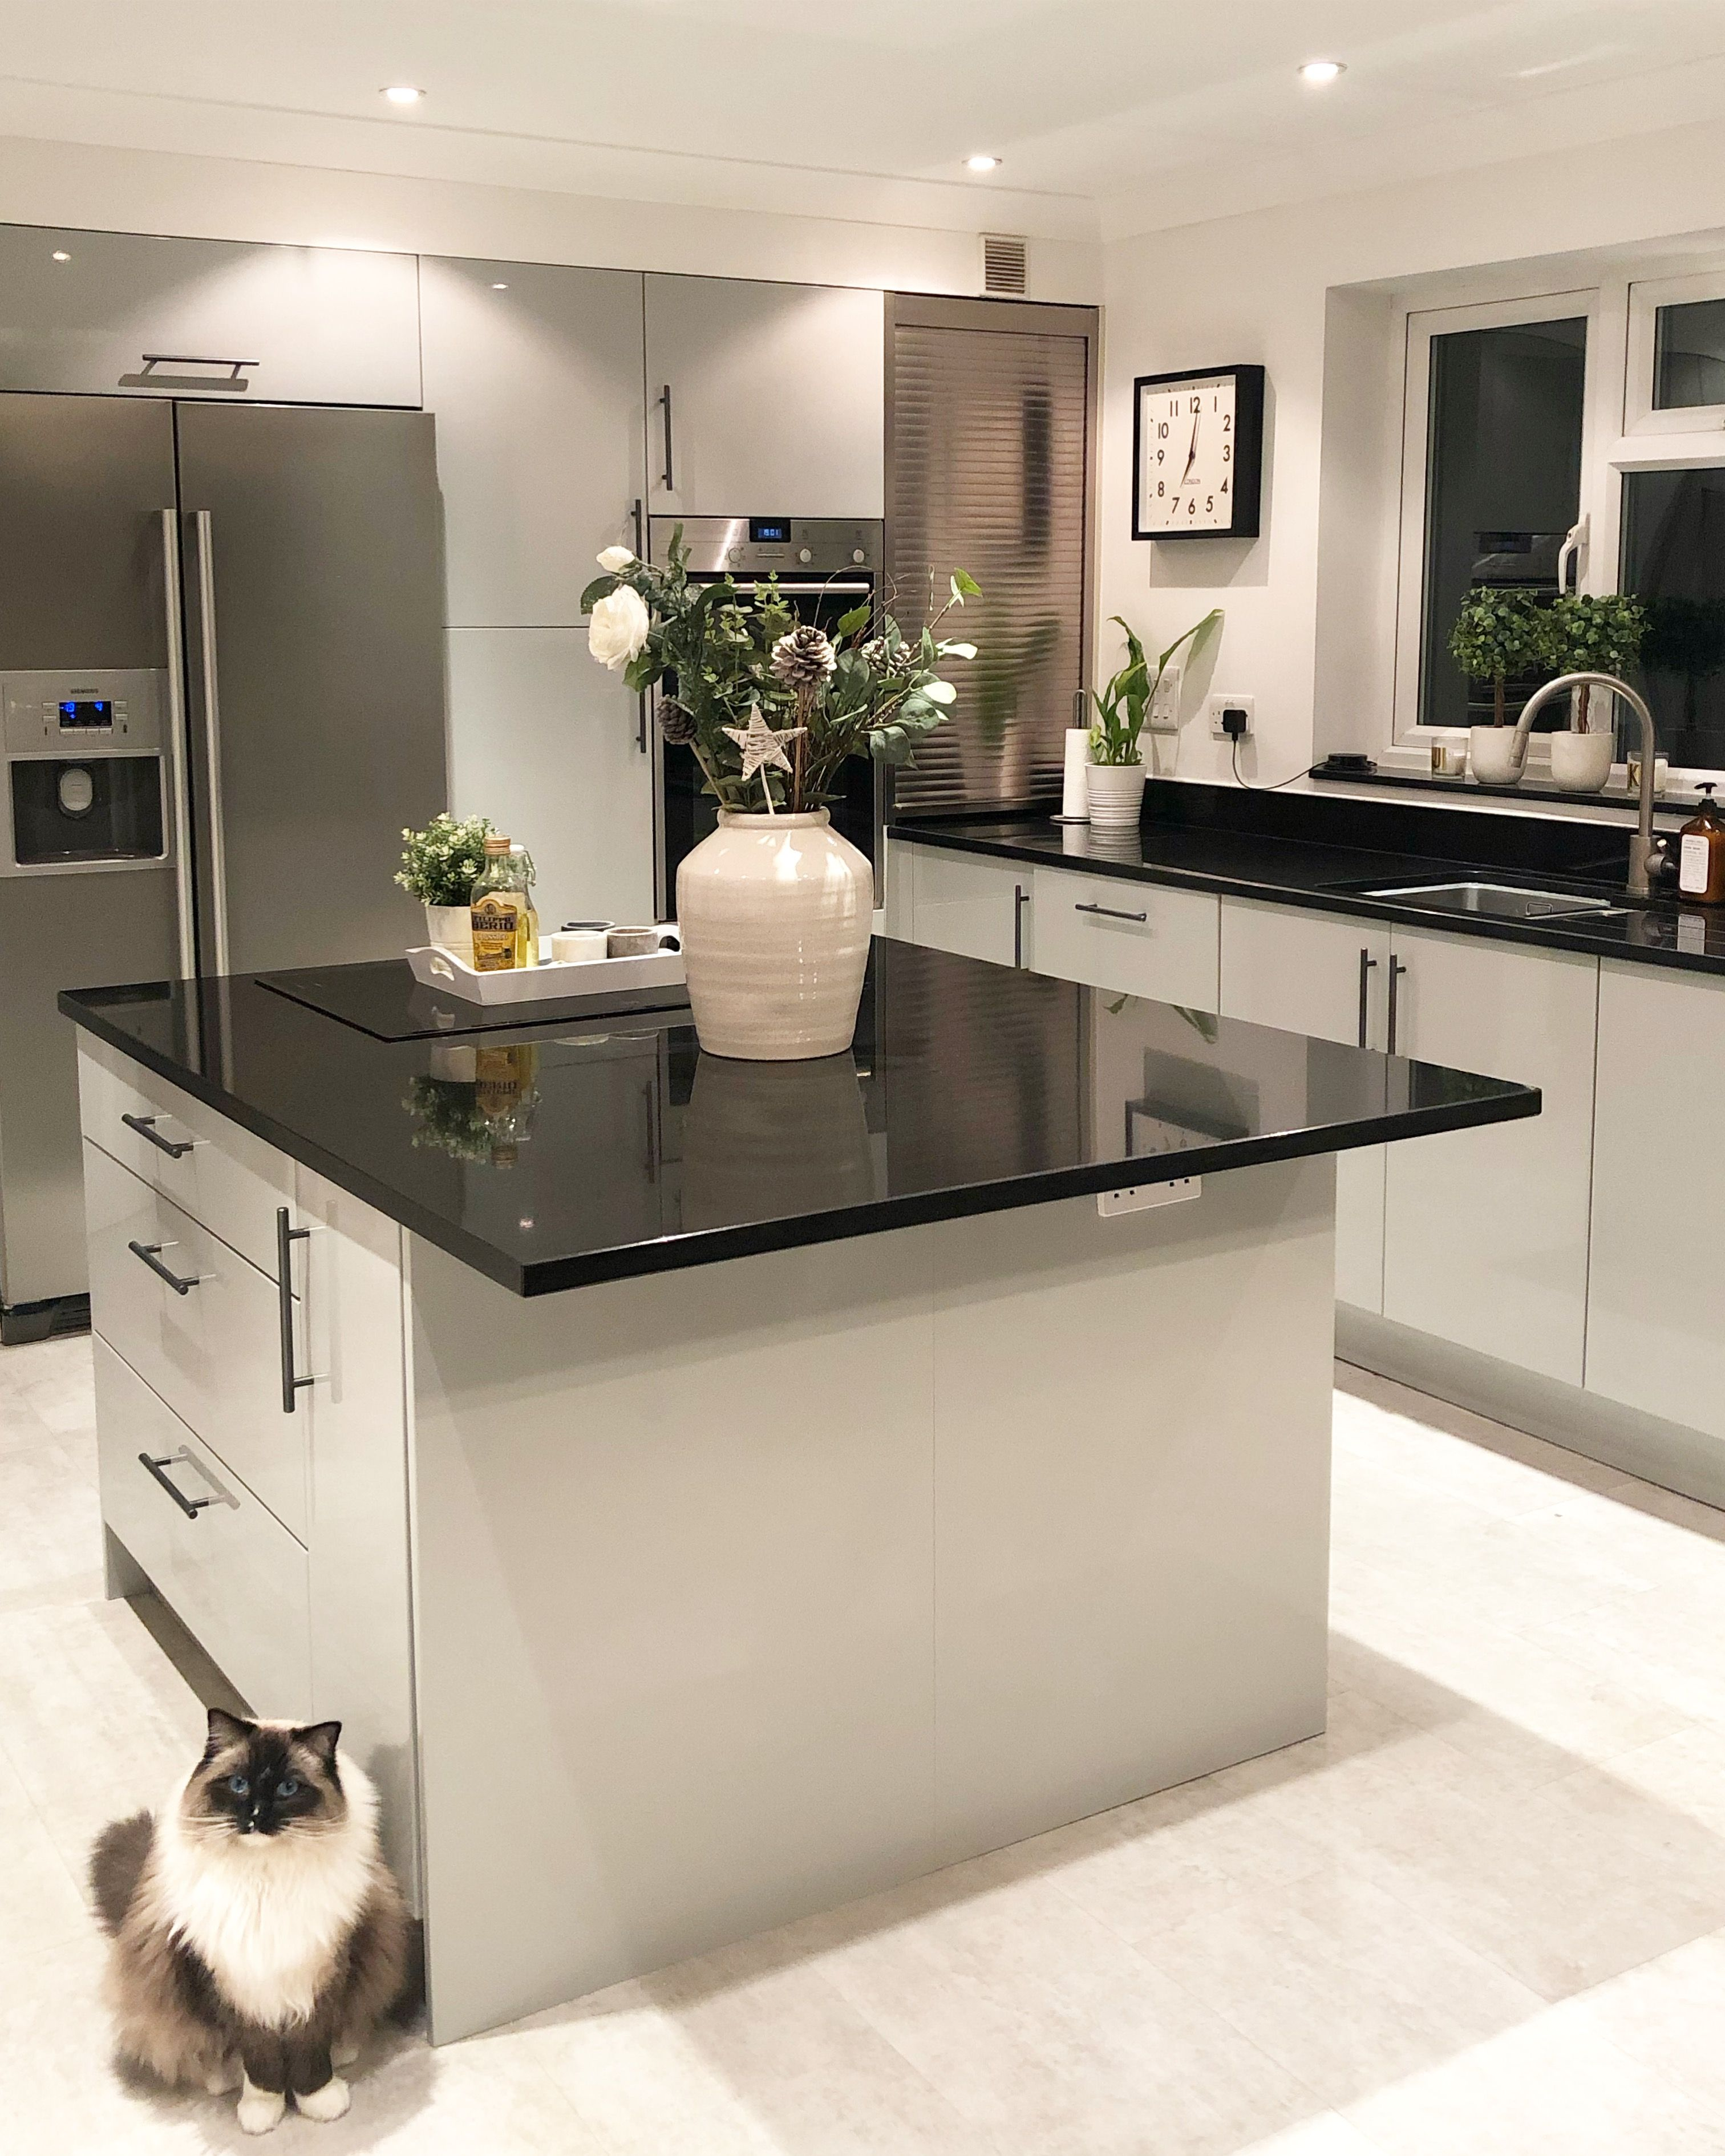 Grey Gloss Kitchen And Island Home Decor Kitchen Grey Gloss Kitchen Kitchen Design